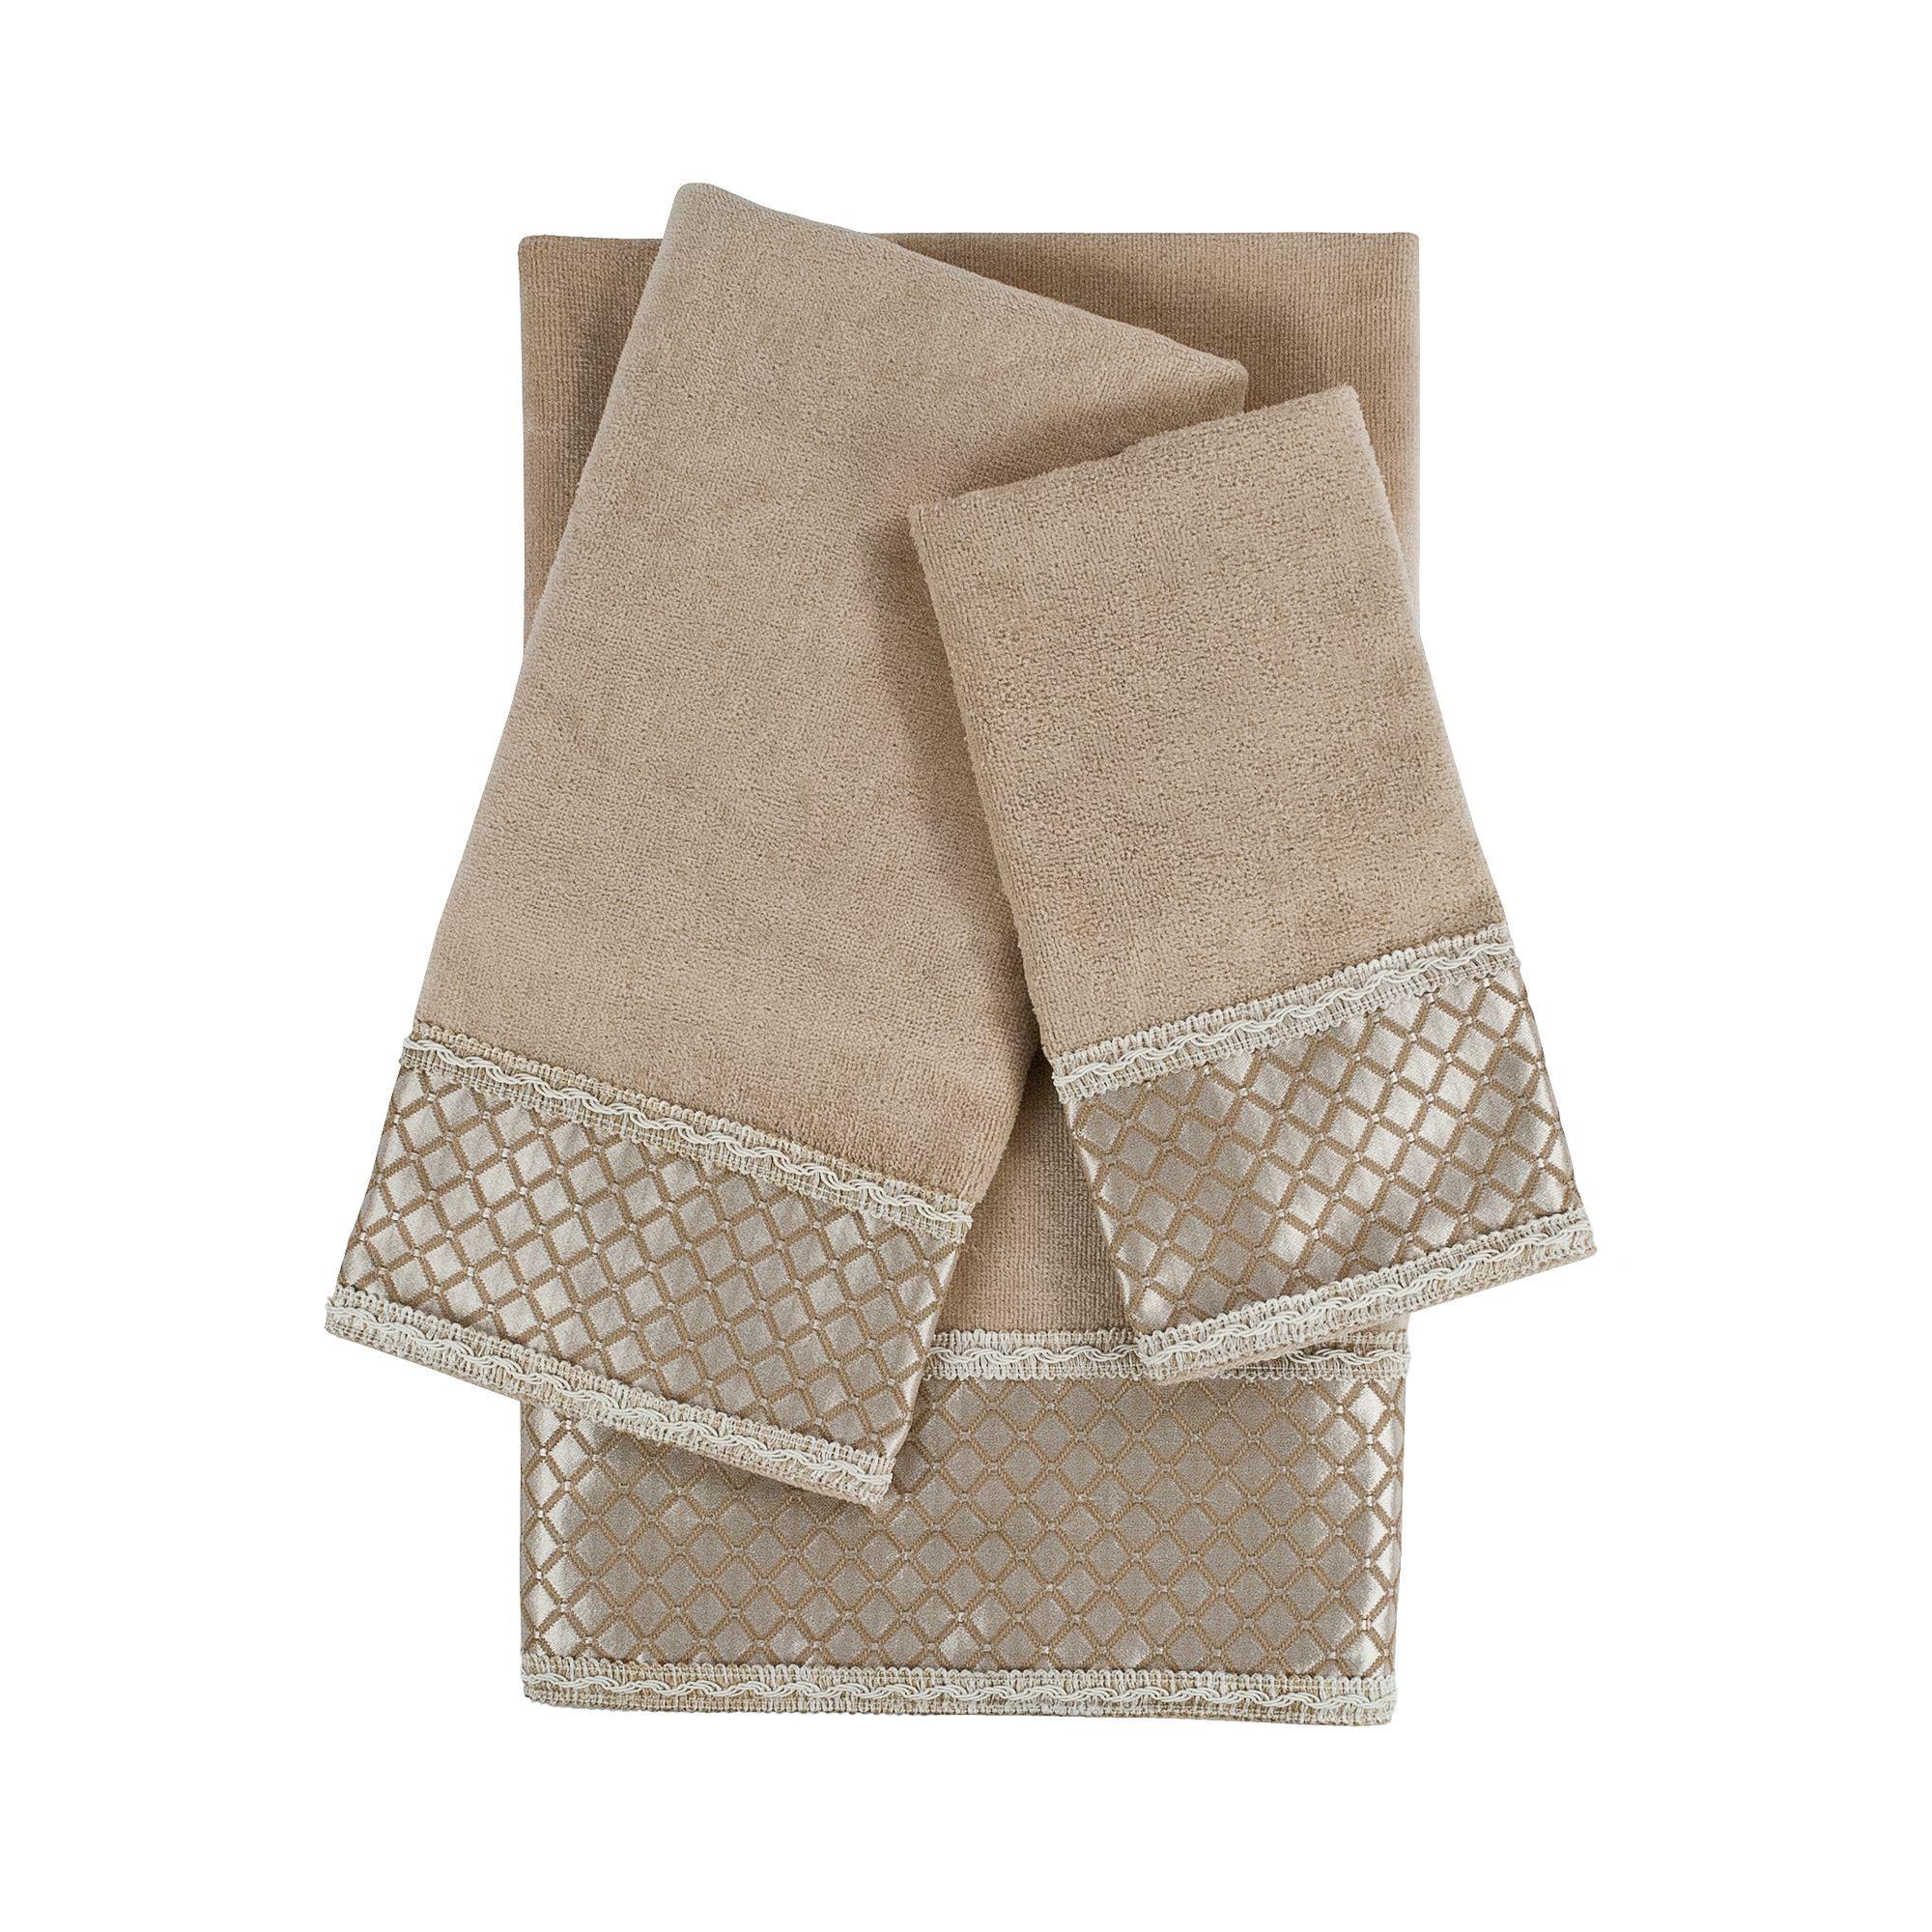 Sherry Kline Manor Taupe 3 Piece Decorative Embellished Towel Set Towel Set Towel Bath Towel Sets